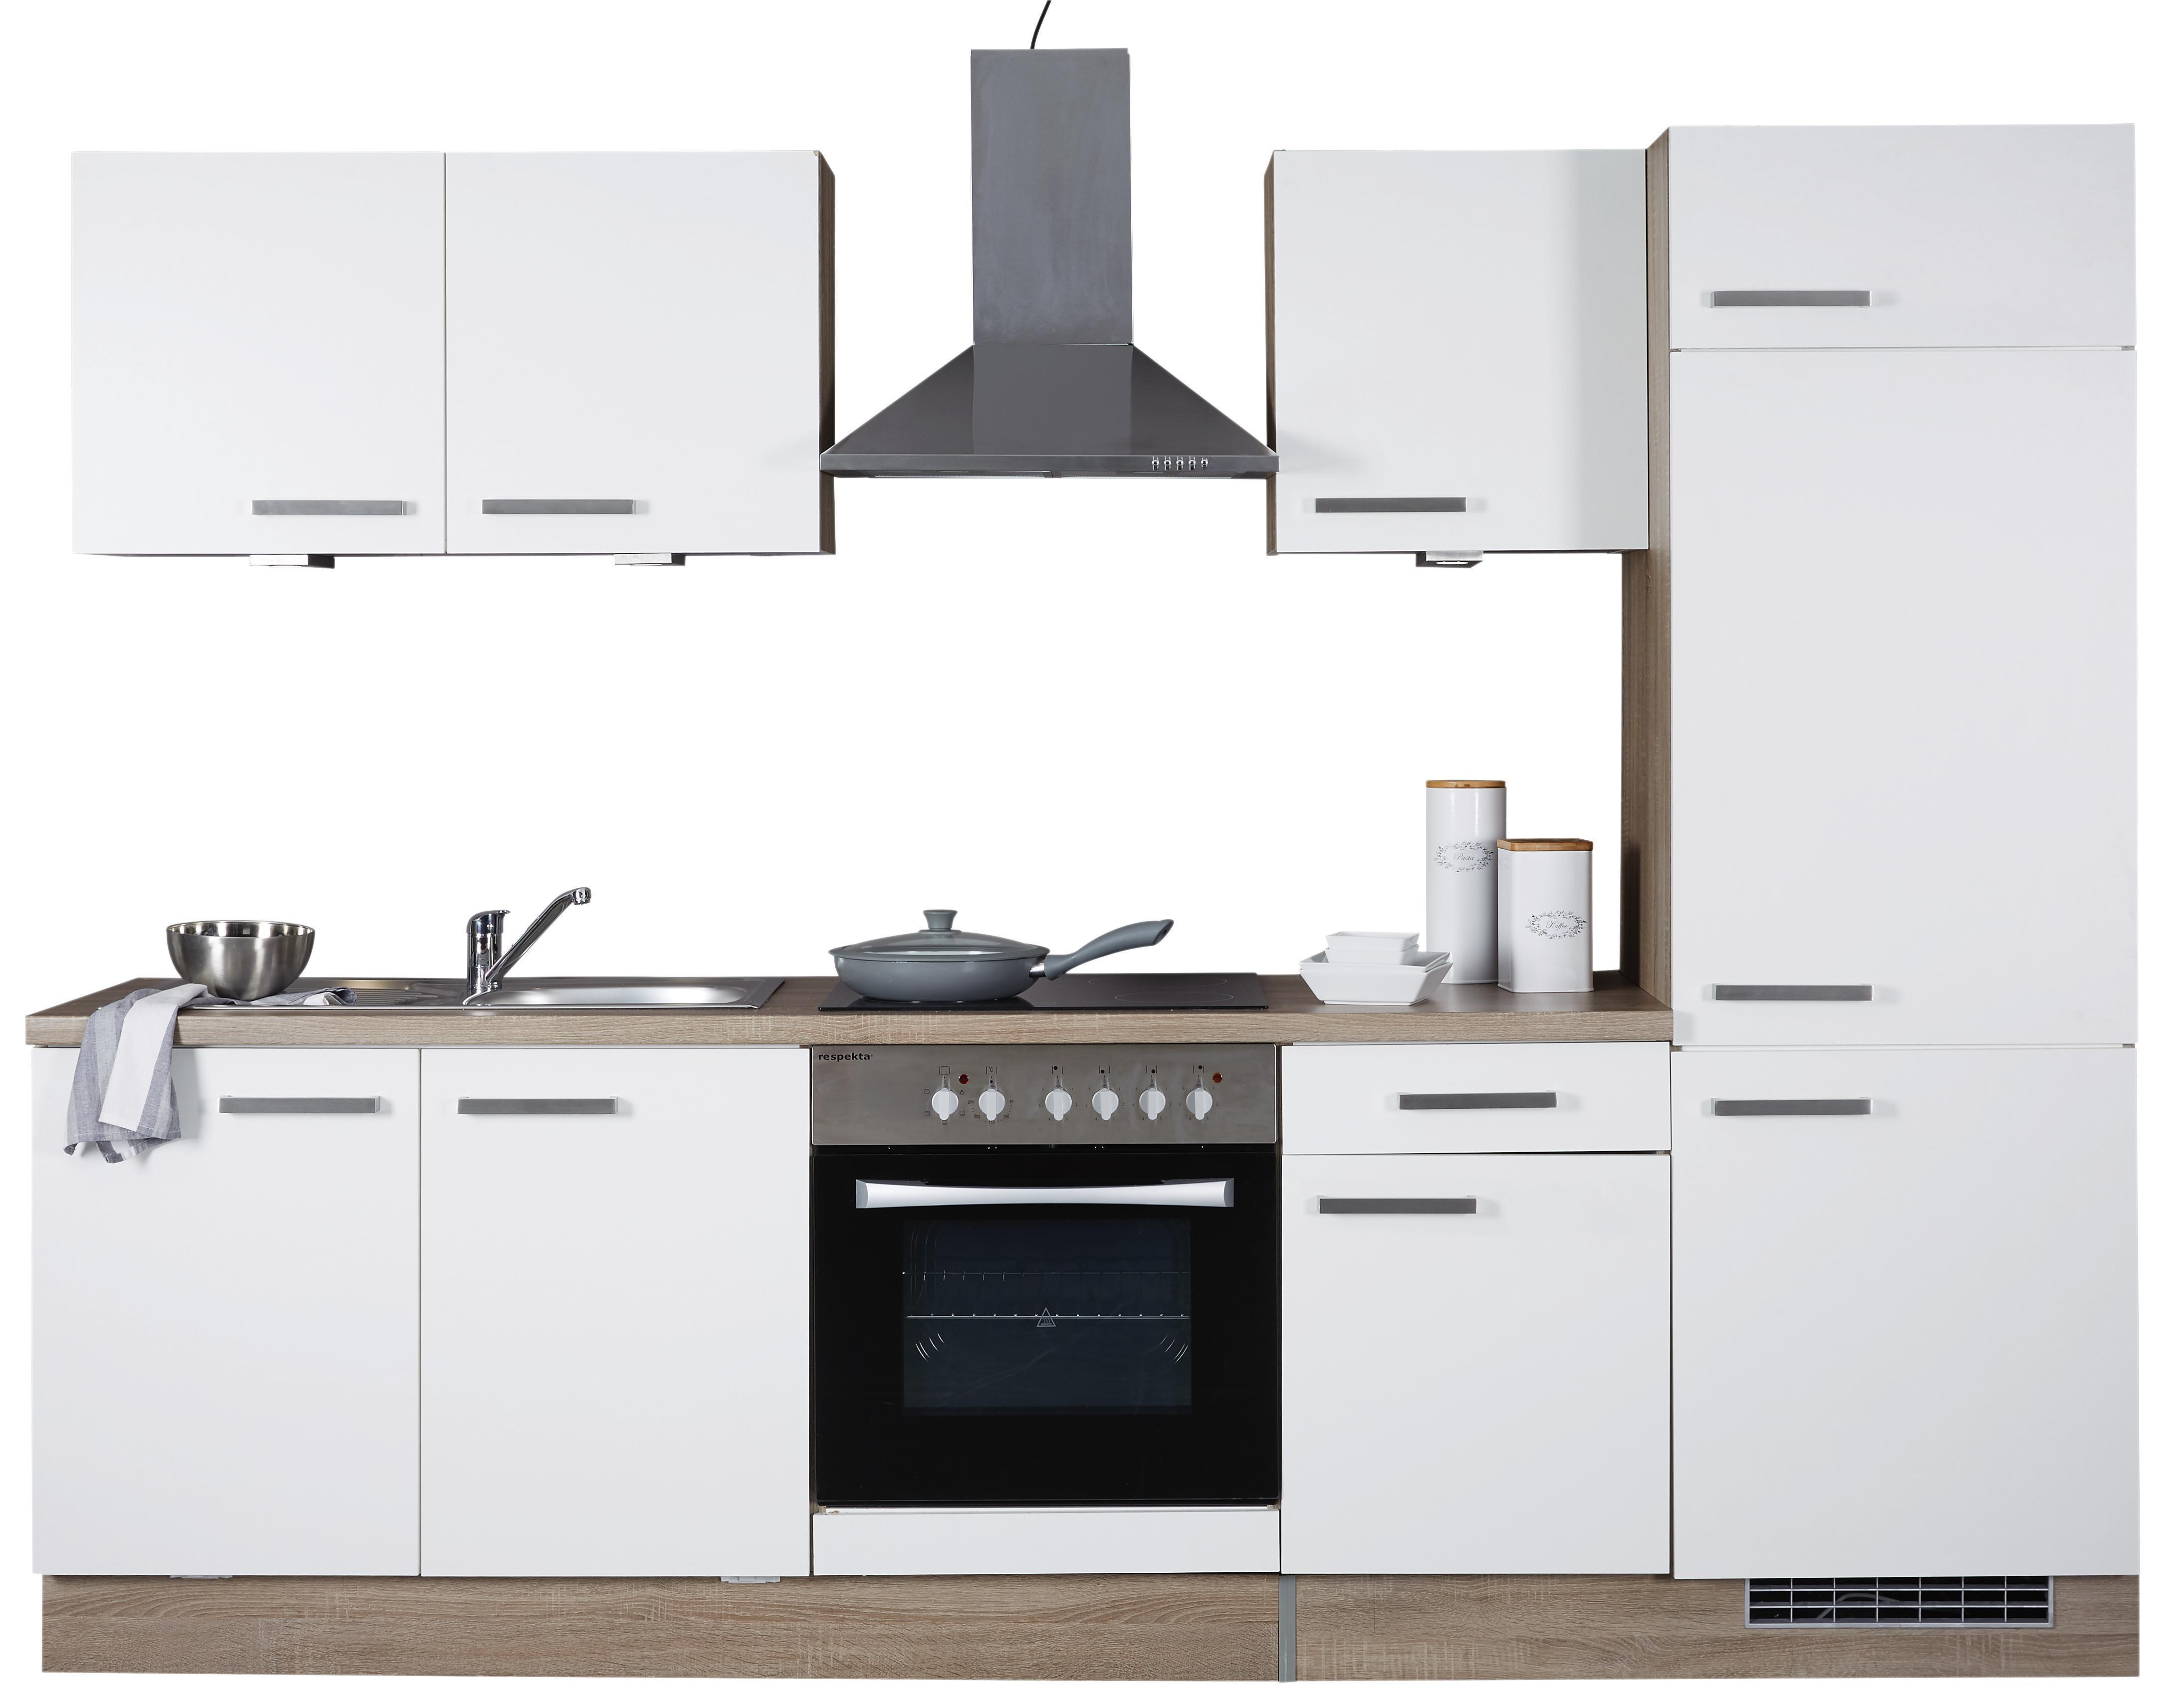 Mini Küchenblock Mit Kühlschrank : Mini küche cm respekta miniküche mit e geräten breite cm